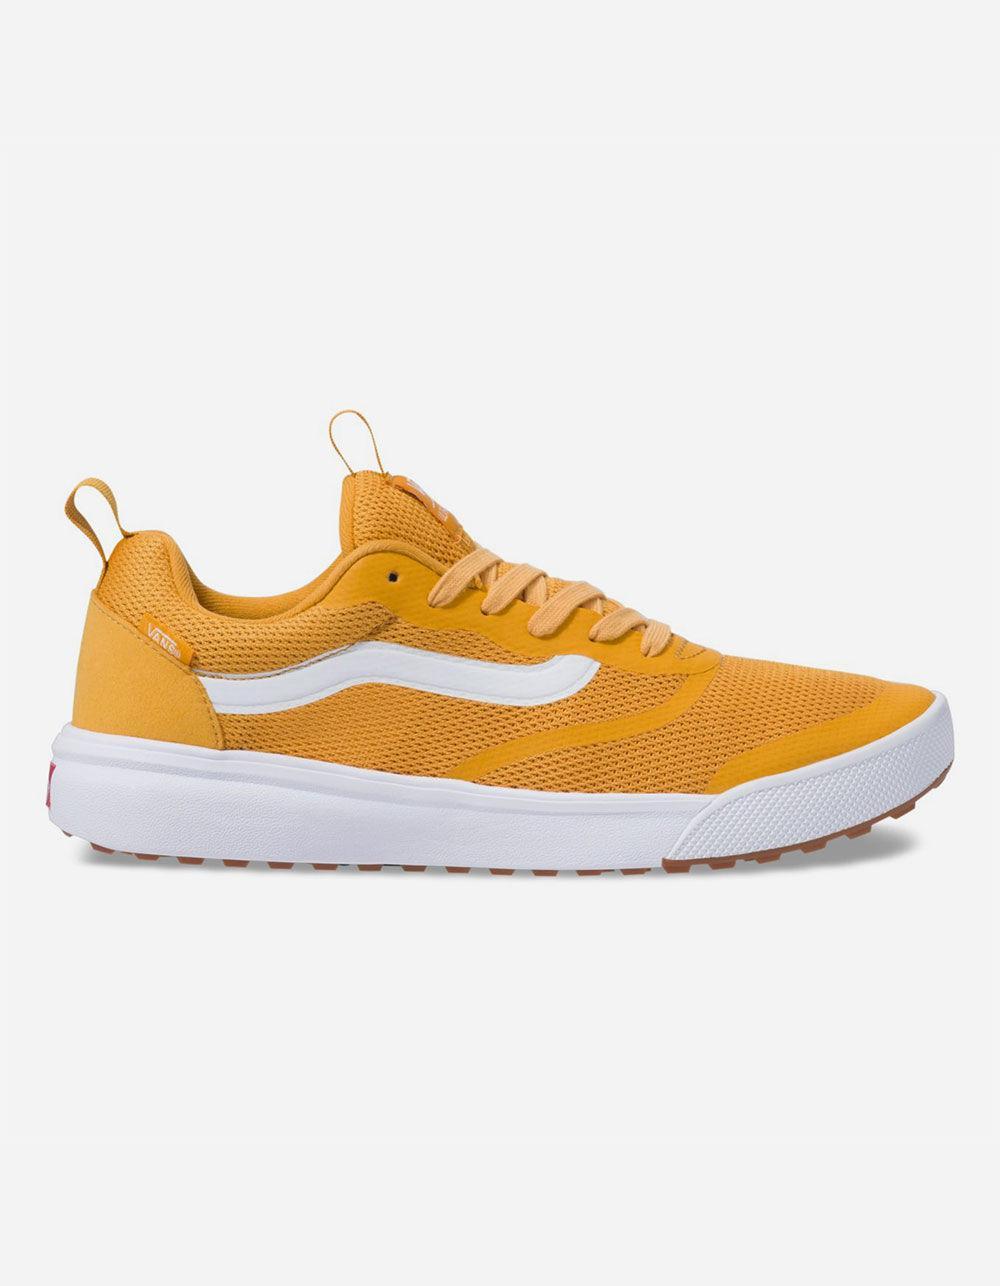 07bfa6f2c8dd Lyst - Vans Ultrarange Rapidweld Sunflower   True White Womens Shoes ...